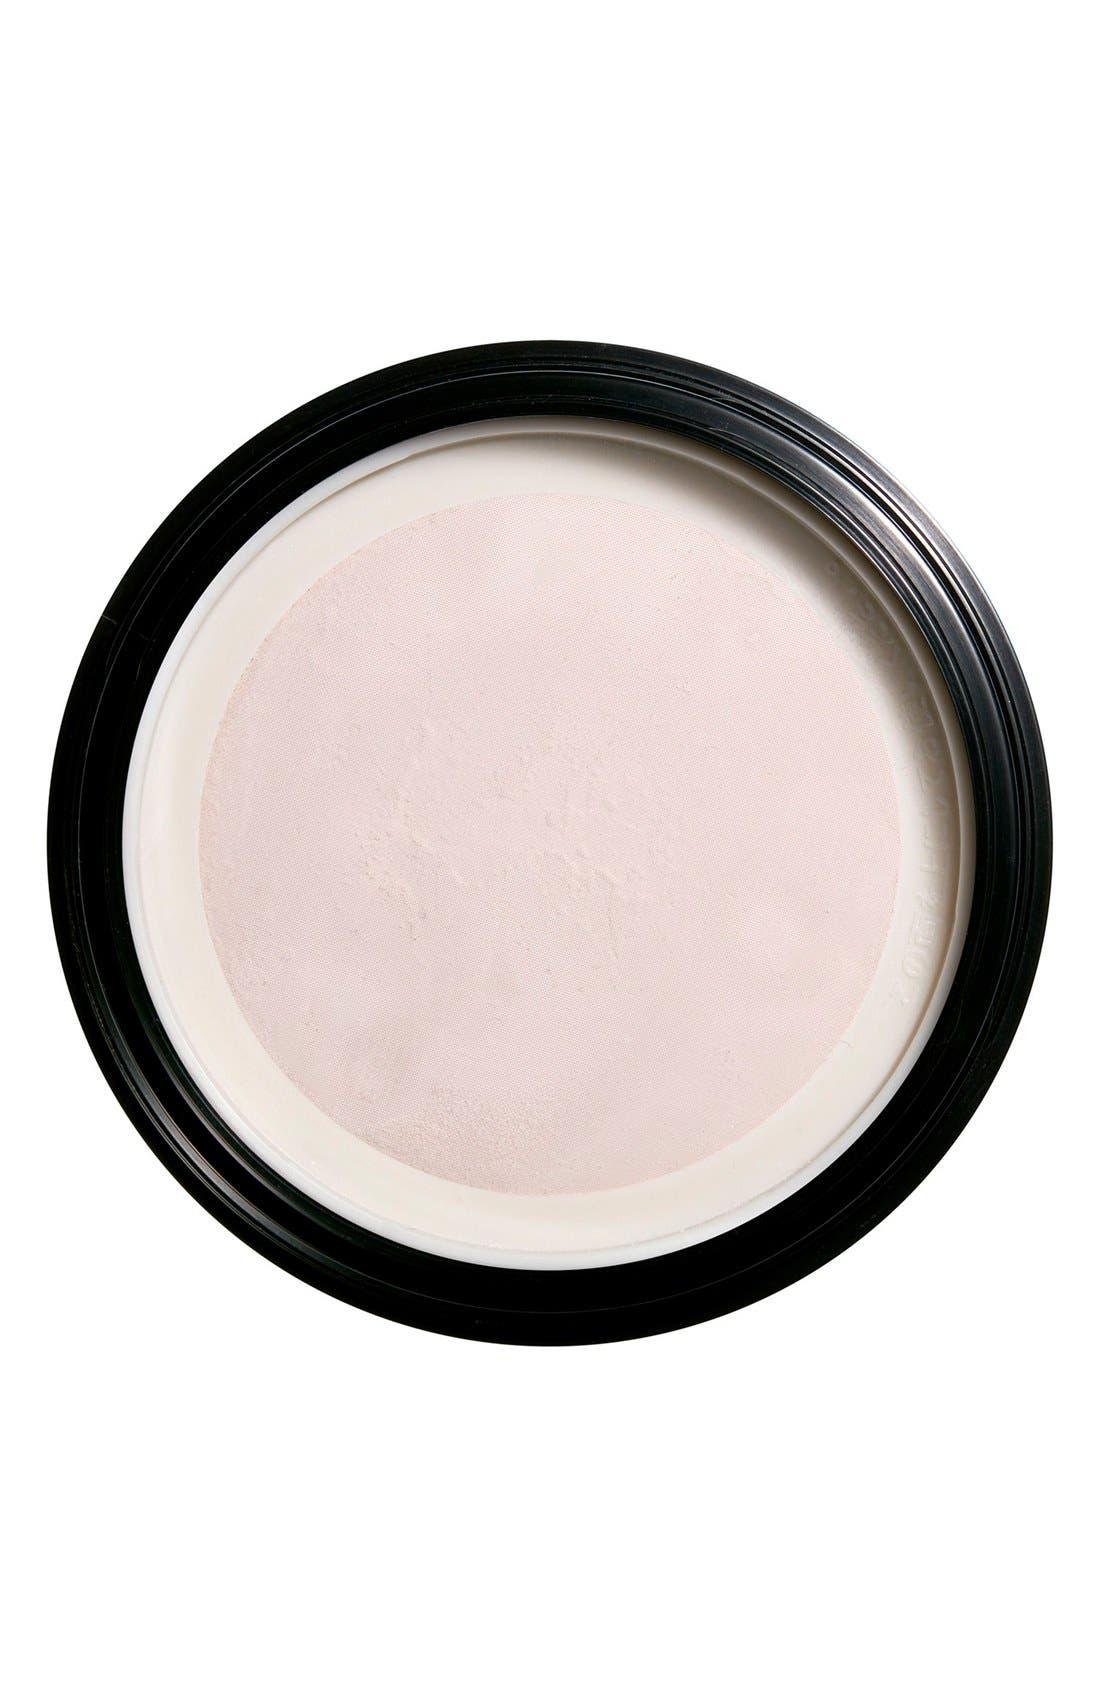 Translucent Loose Powder Refill,                             Main thumbnail 1, color,                             NO COLOR